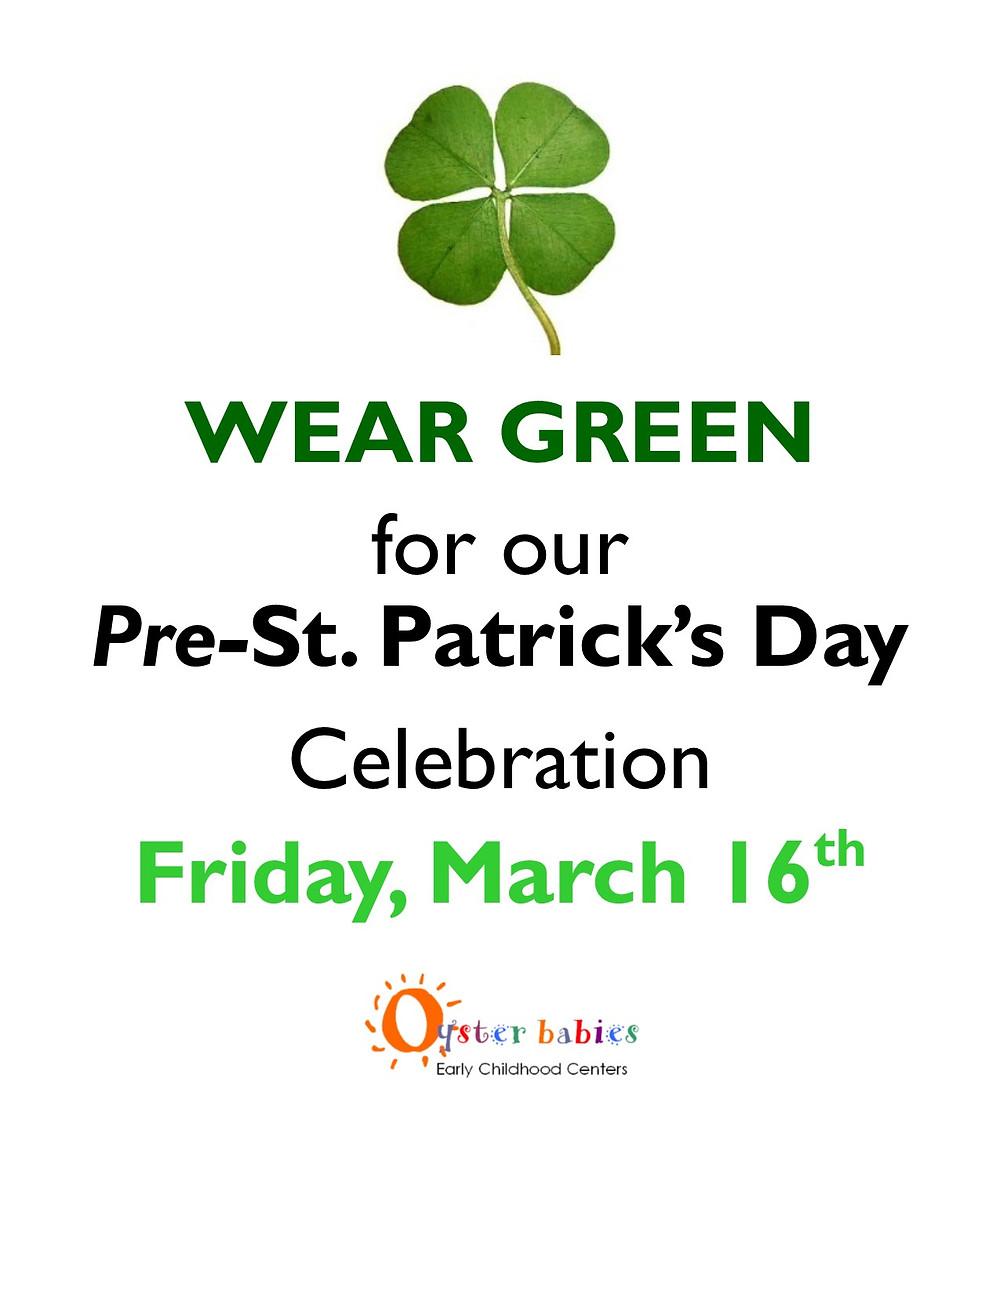 WEAR GREEN, Fri 3/16 ~ Pre-St. Patrick's Day Celebration